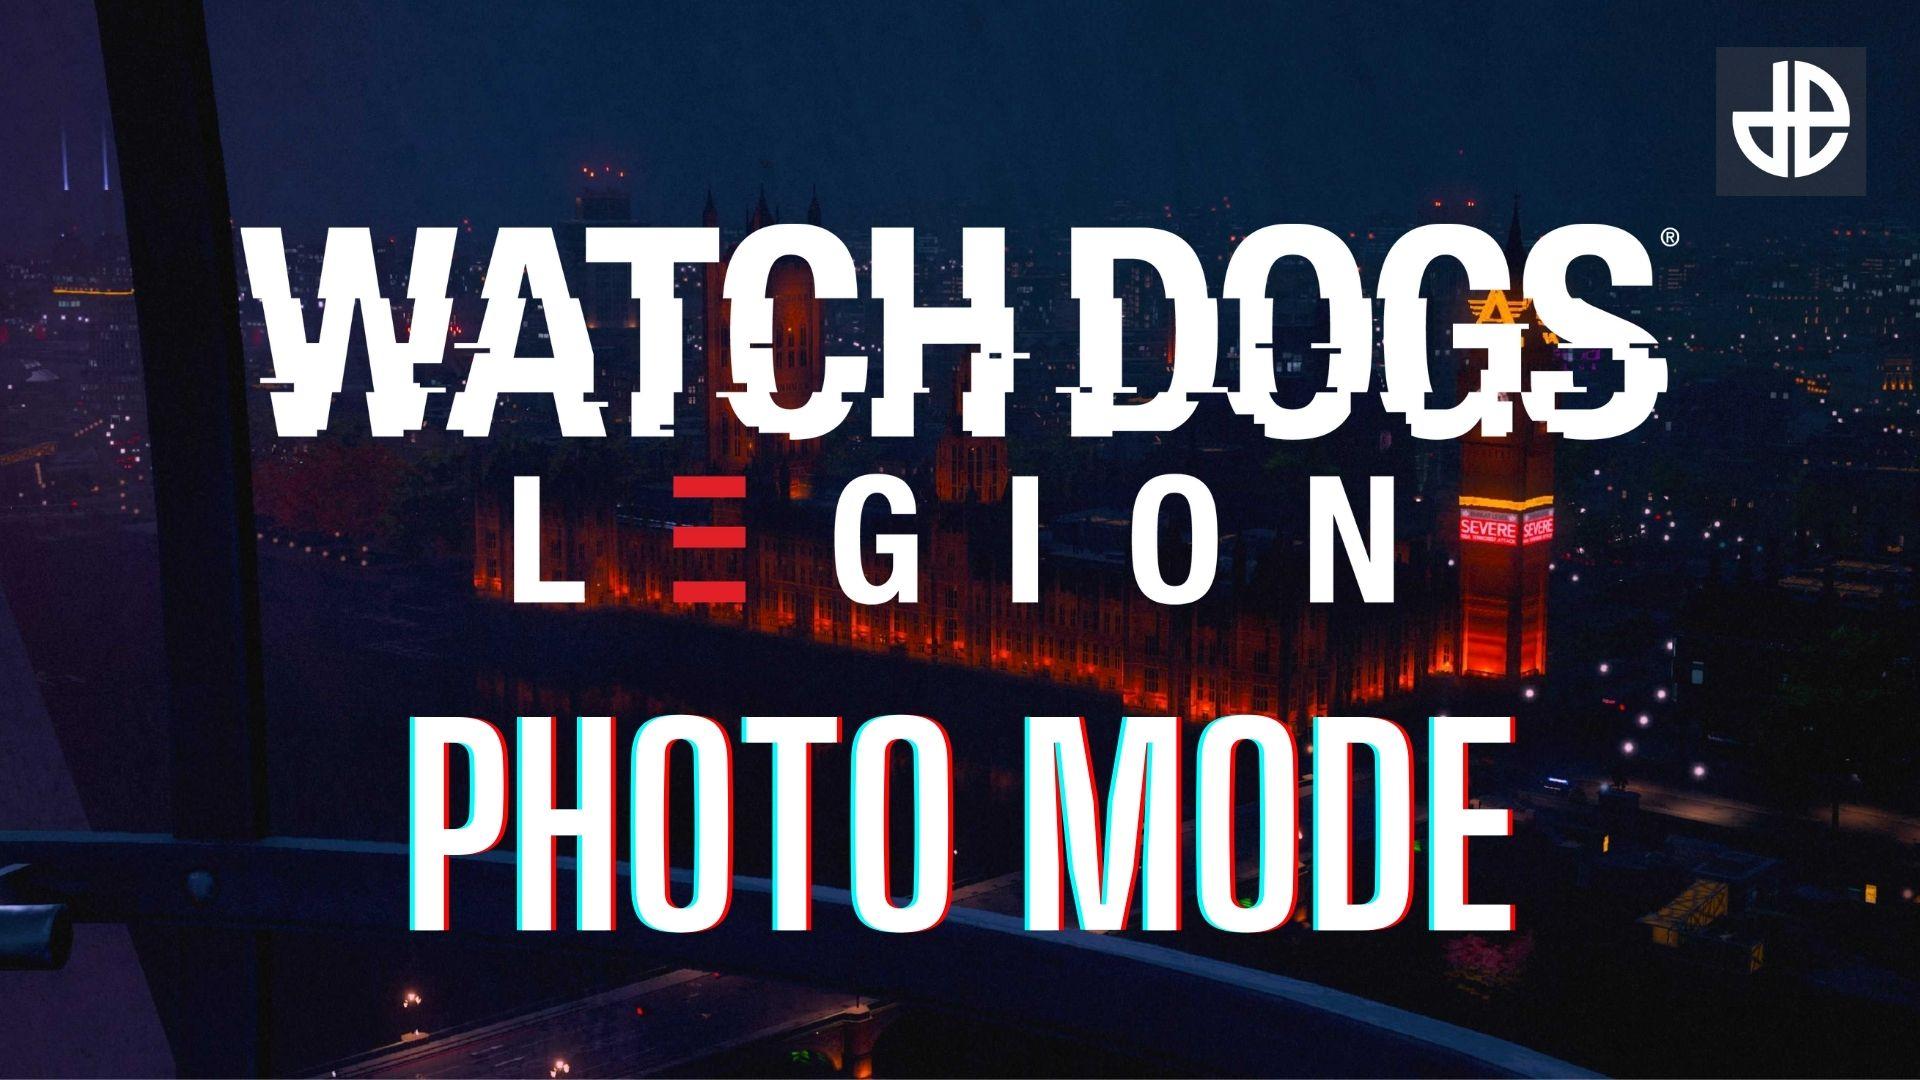 Watch Dogs Legion photo mode